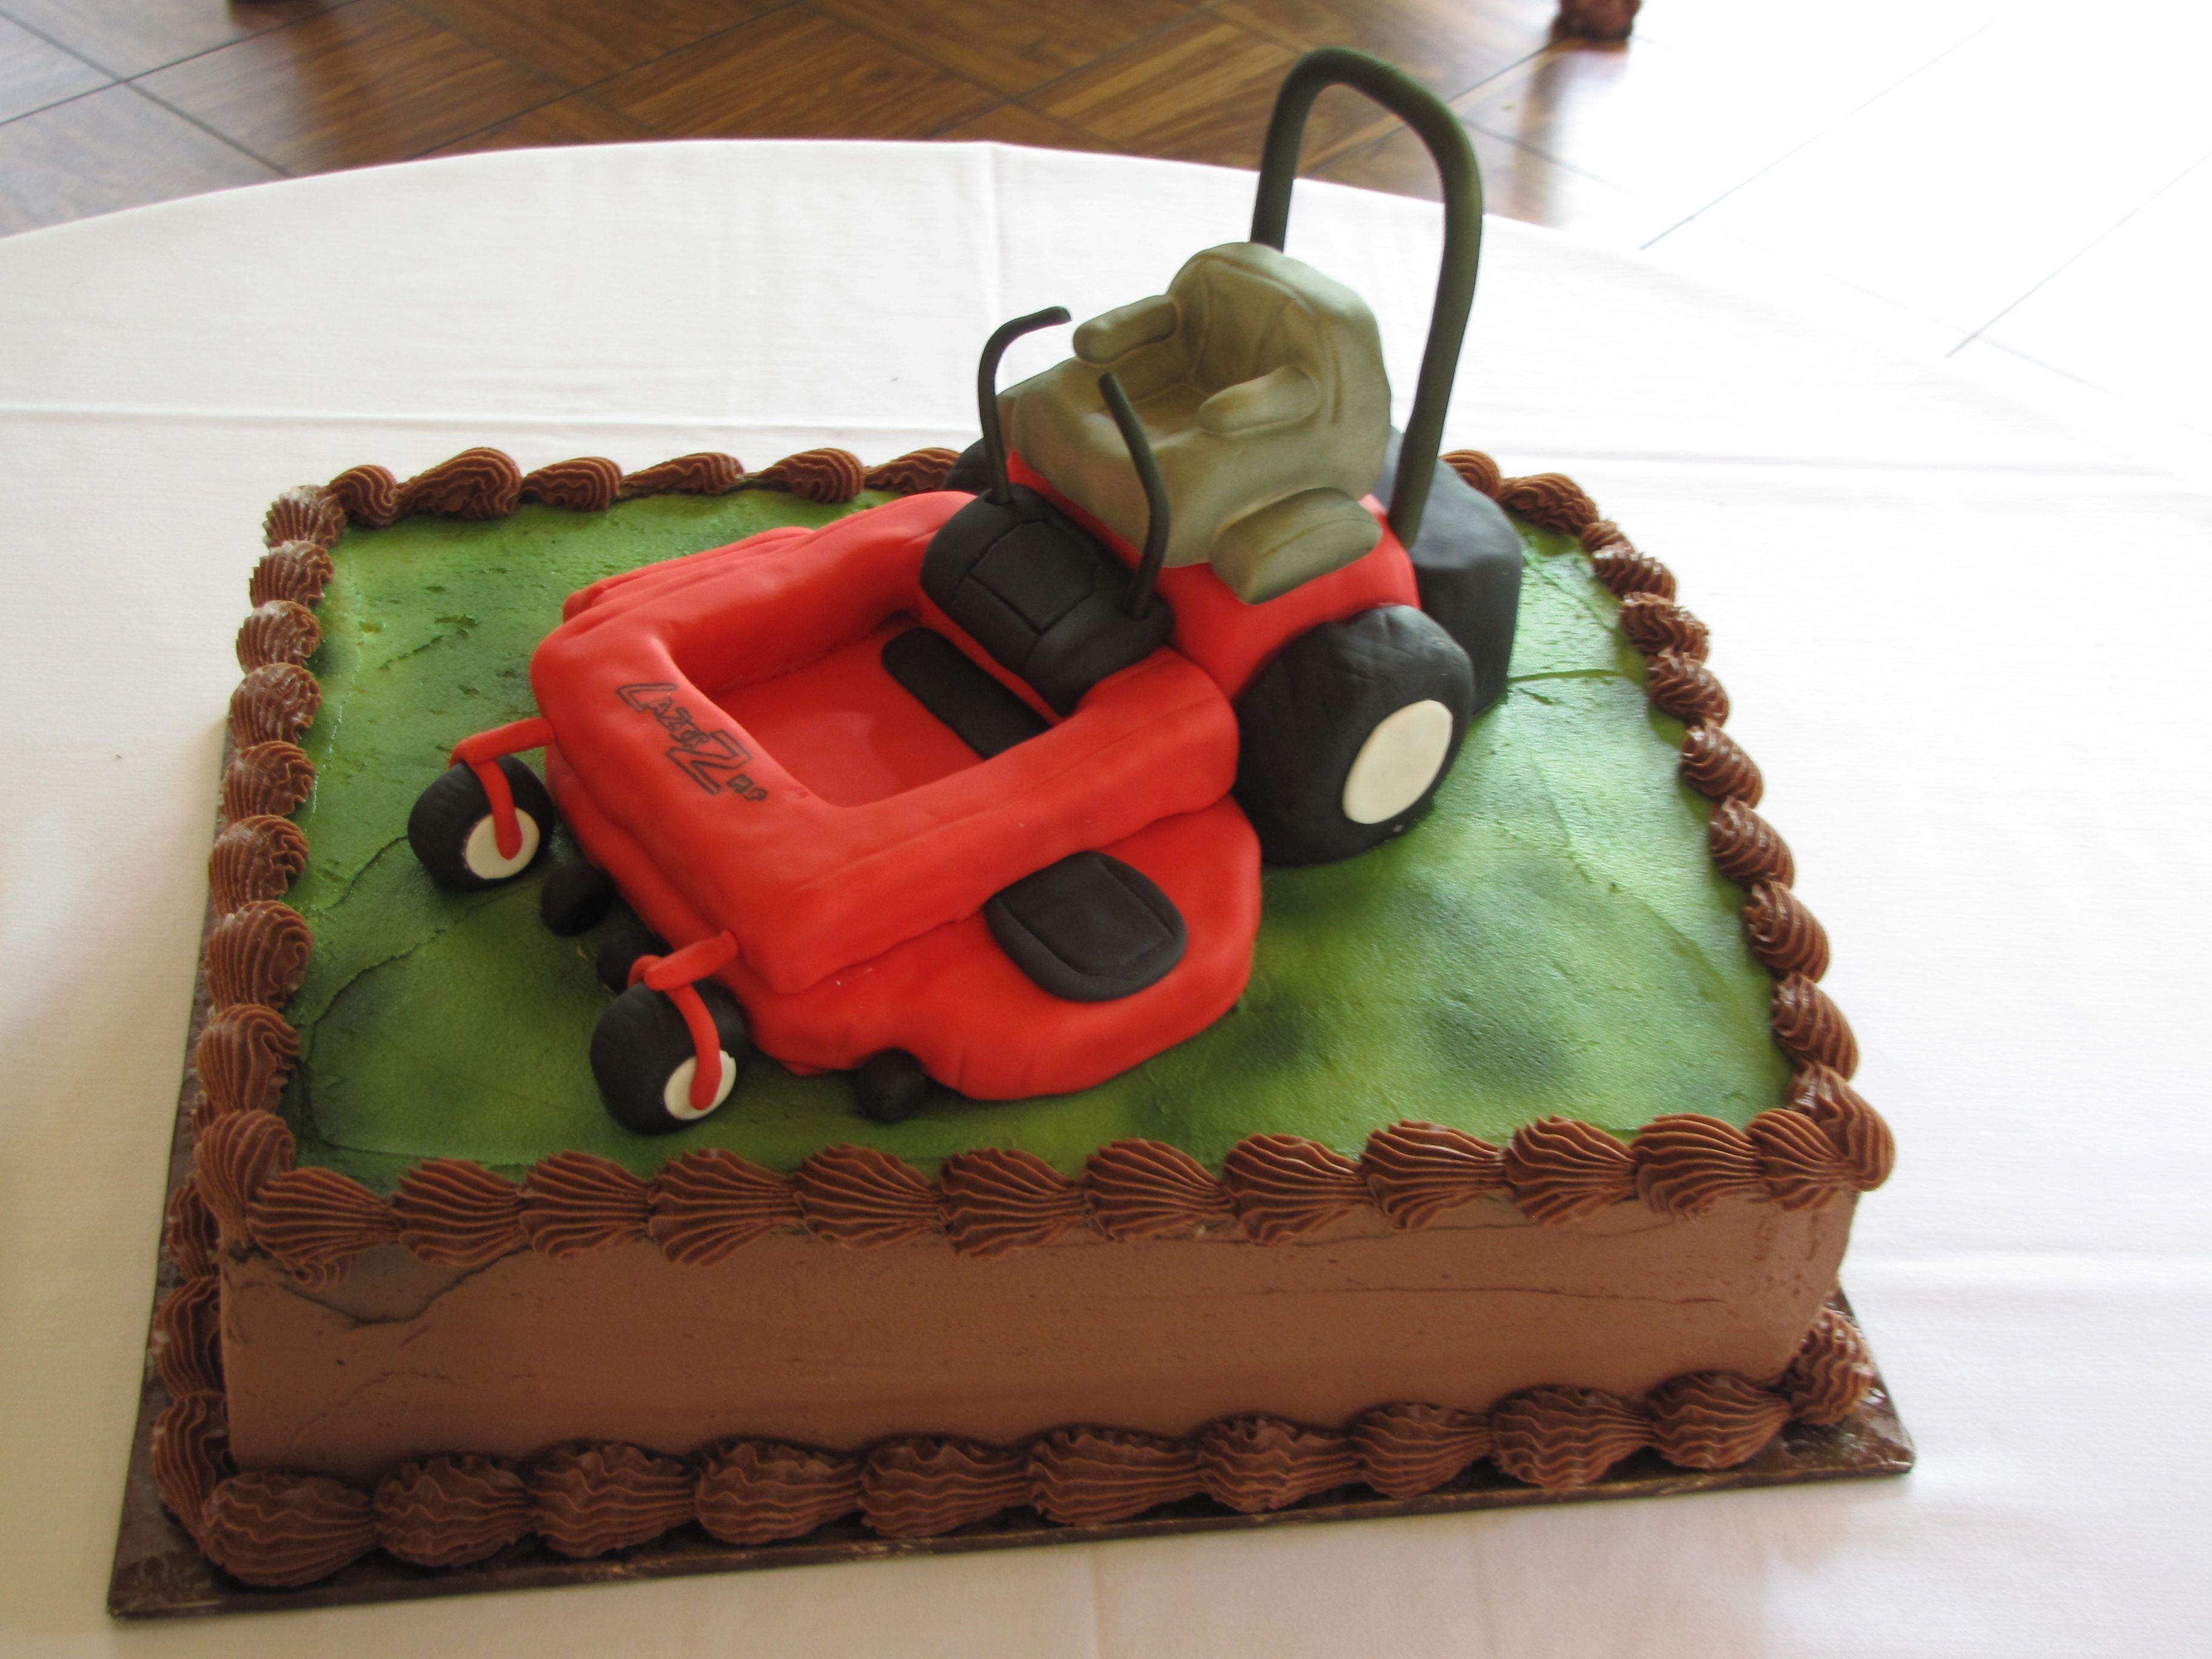 Lawnmower Groom's Cake | Lawn mower cake, Grooms cake, Cake